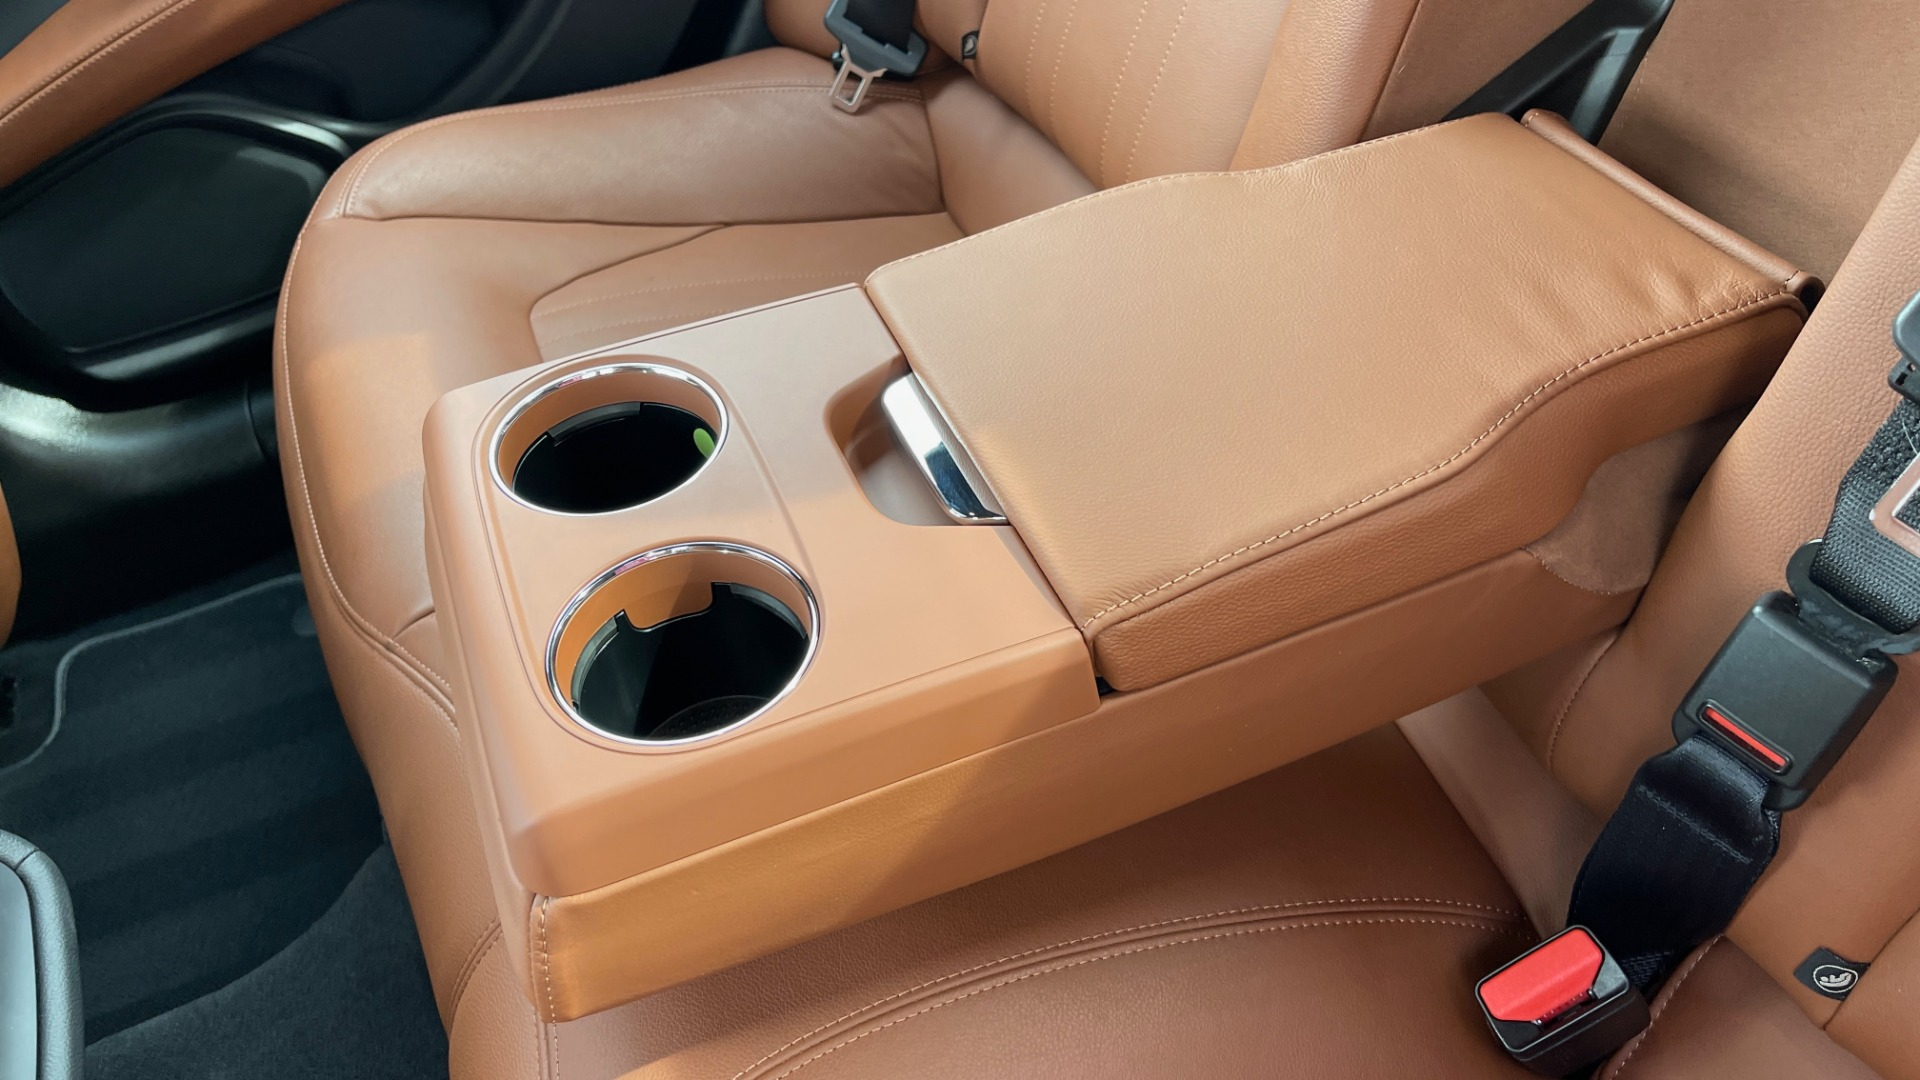 Used 2018 Maserati GHIBLI 3.0L SEDAN / 8-SPD AUTO / NAV / SUNROOF / REARVIEW for sale $42,995 at Formula Imports in Charlotte NC 28227 51